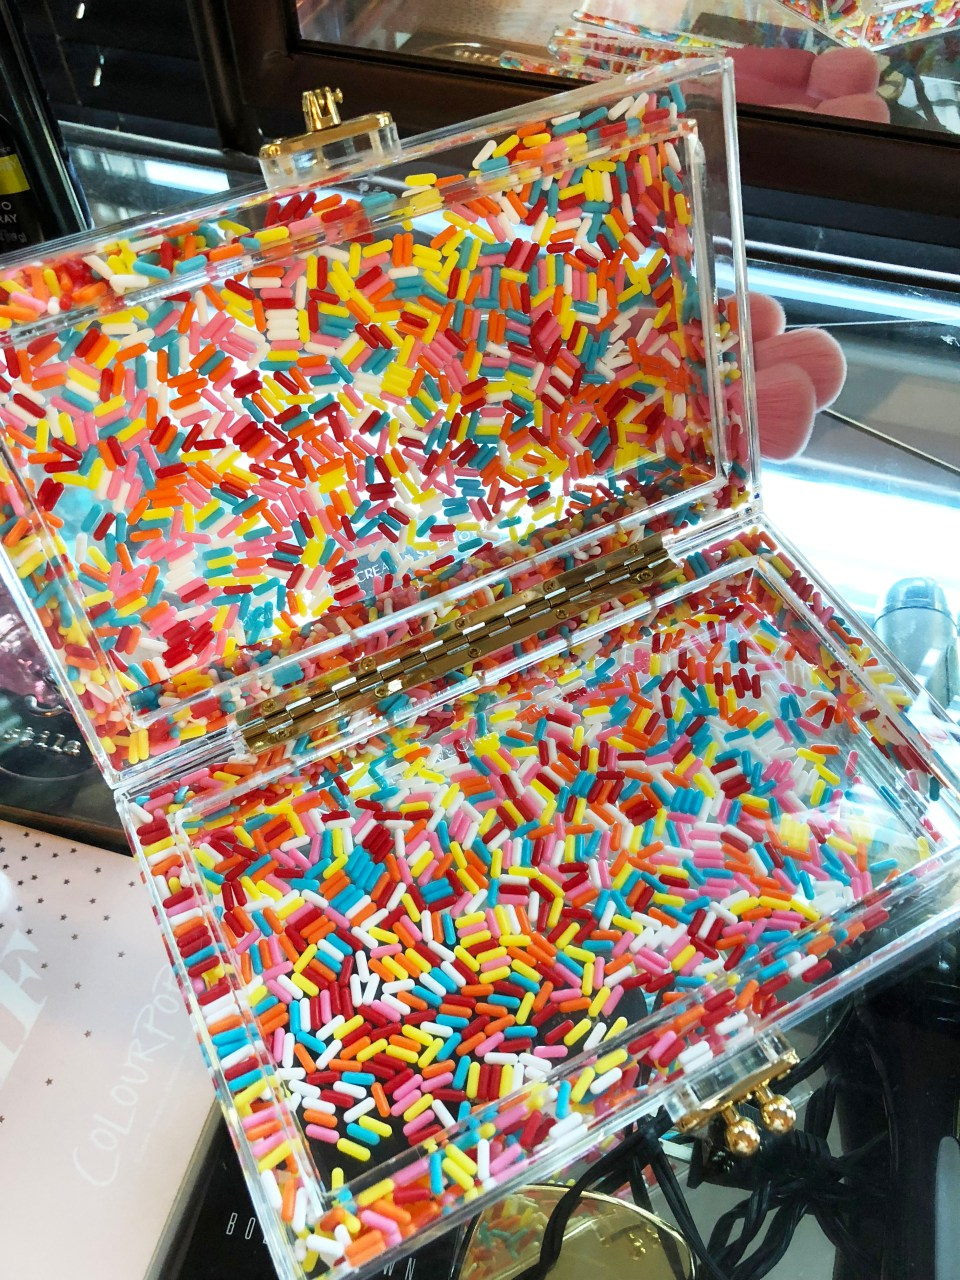 Museum of Ice Cream x Sephora - Sprinkle Clutch 2